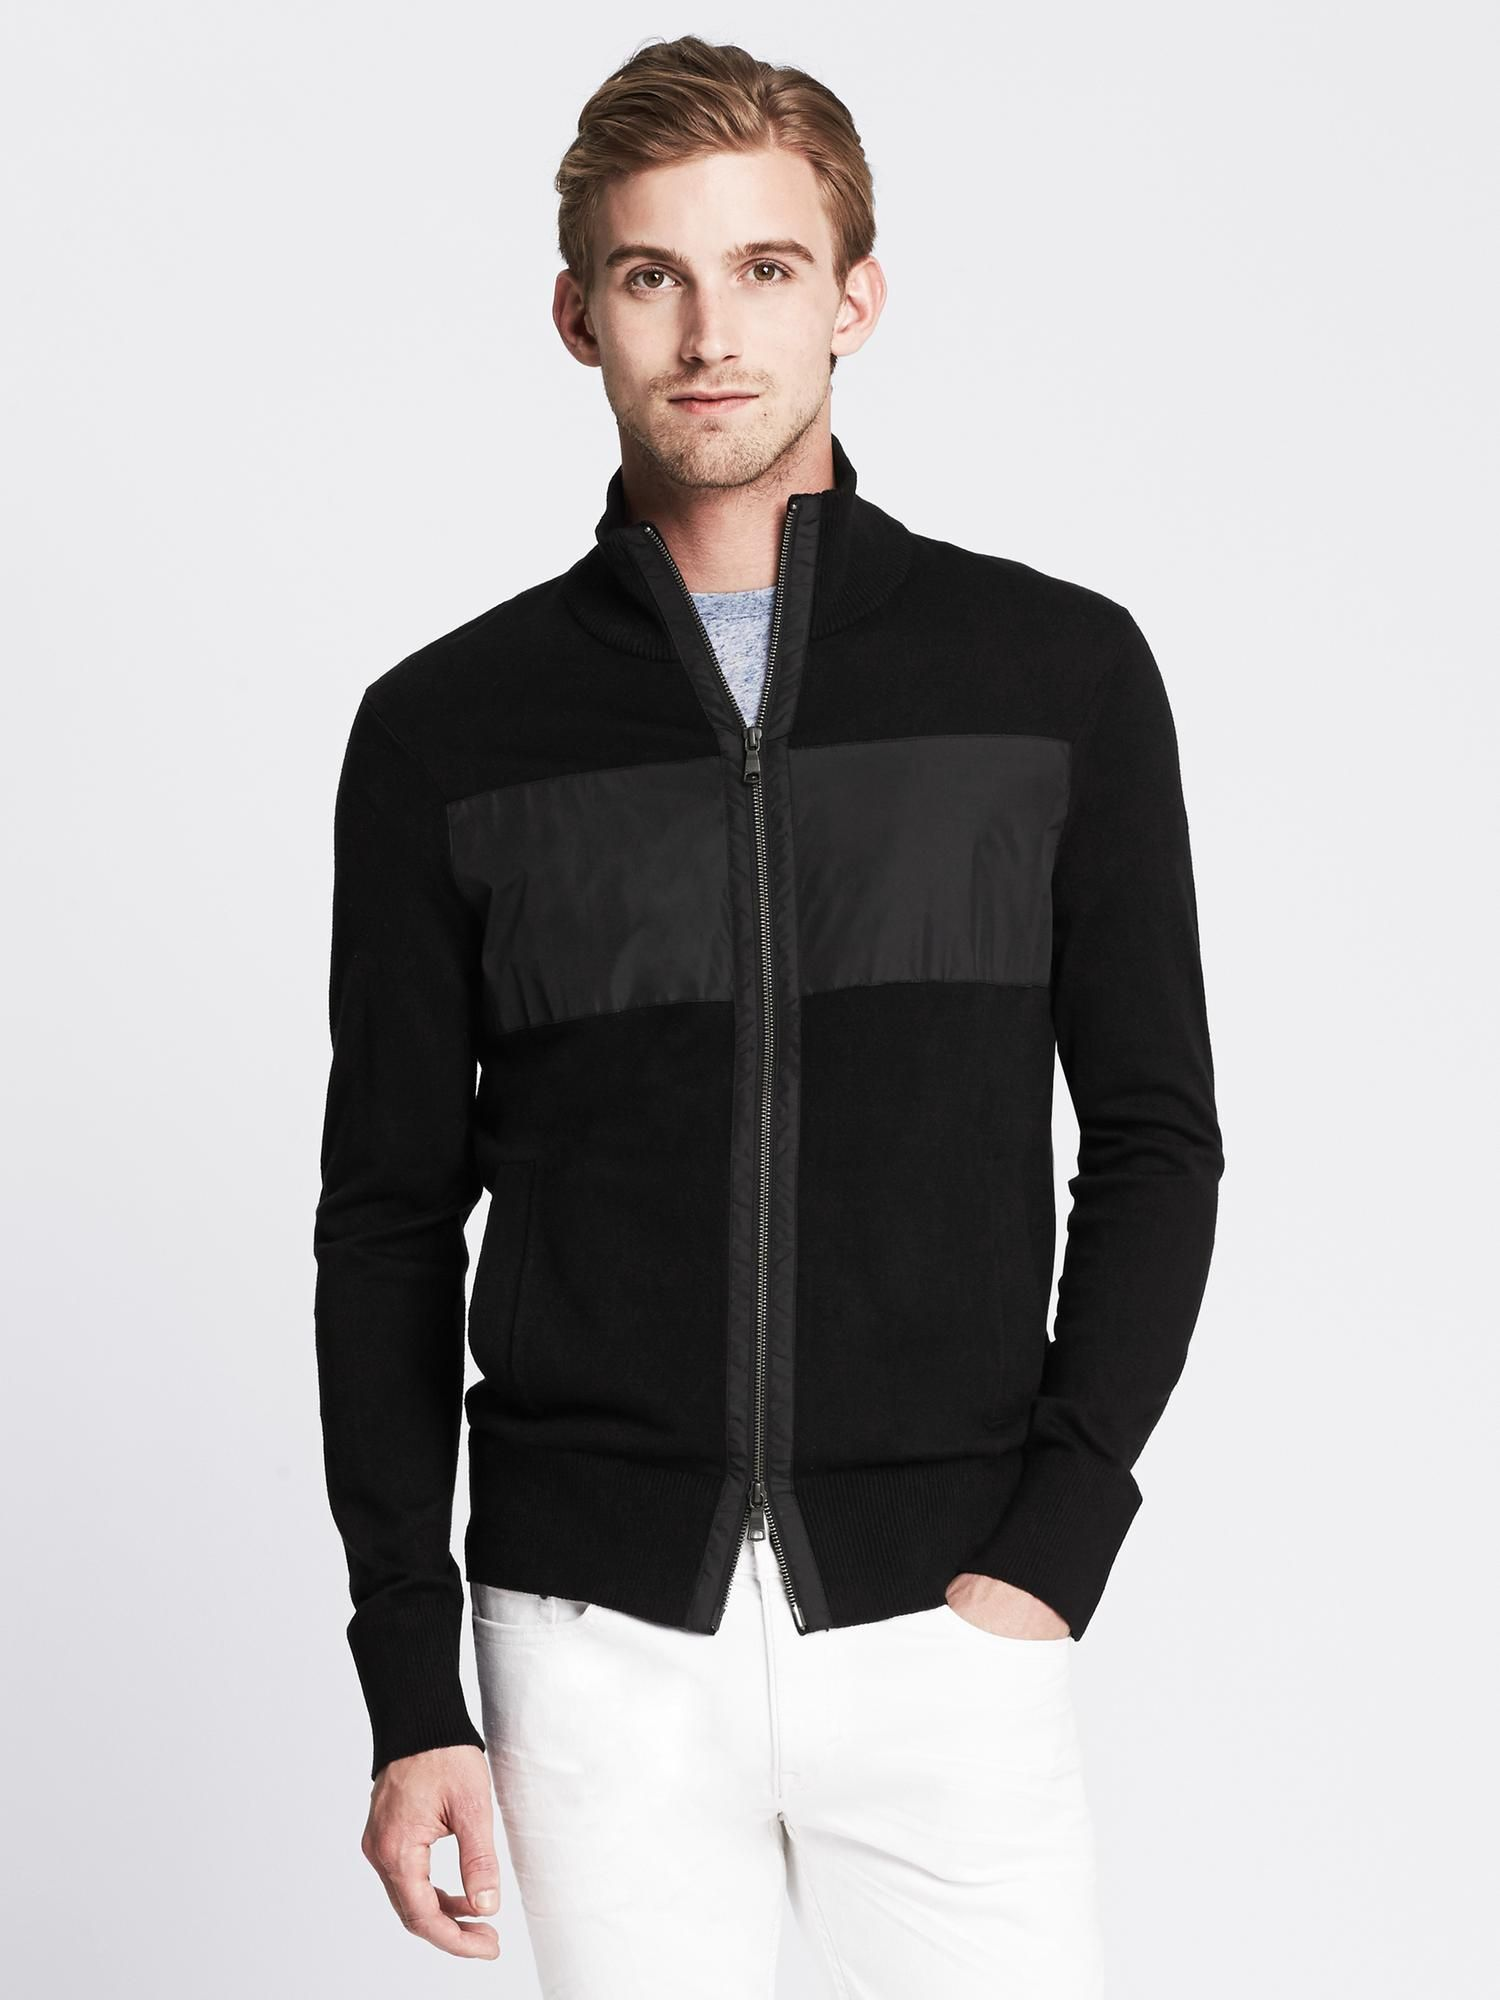 Banana Republic WovenStripe Zip Sweater Jacket Mens